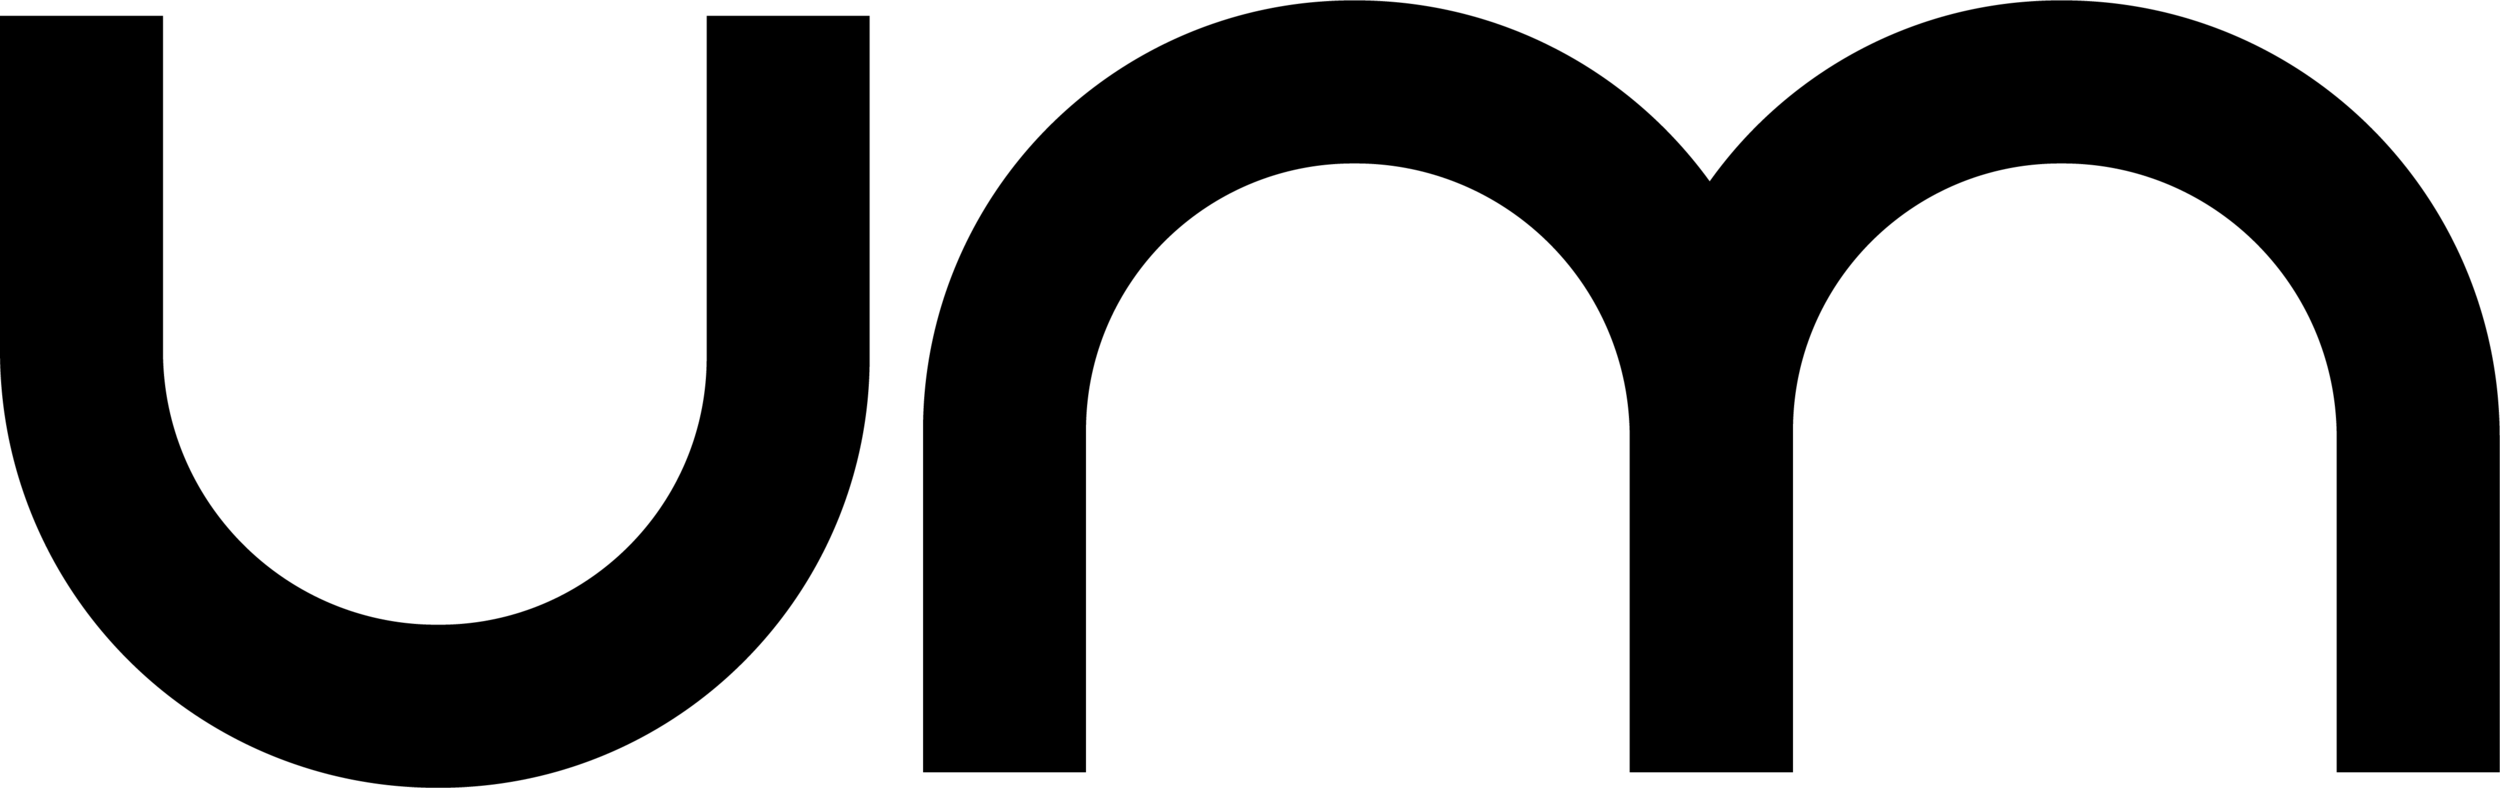 UngMusikk_logo_um_sort.png